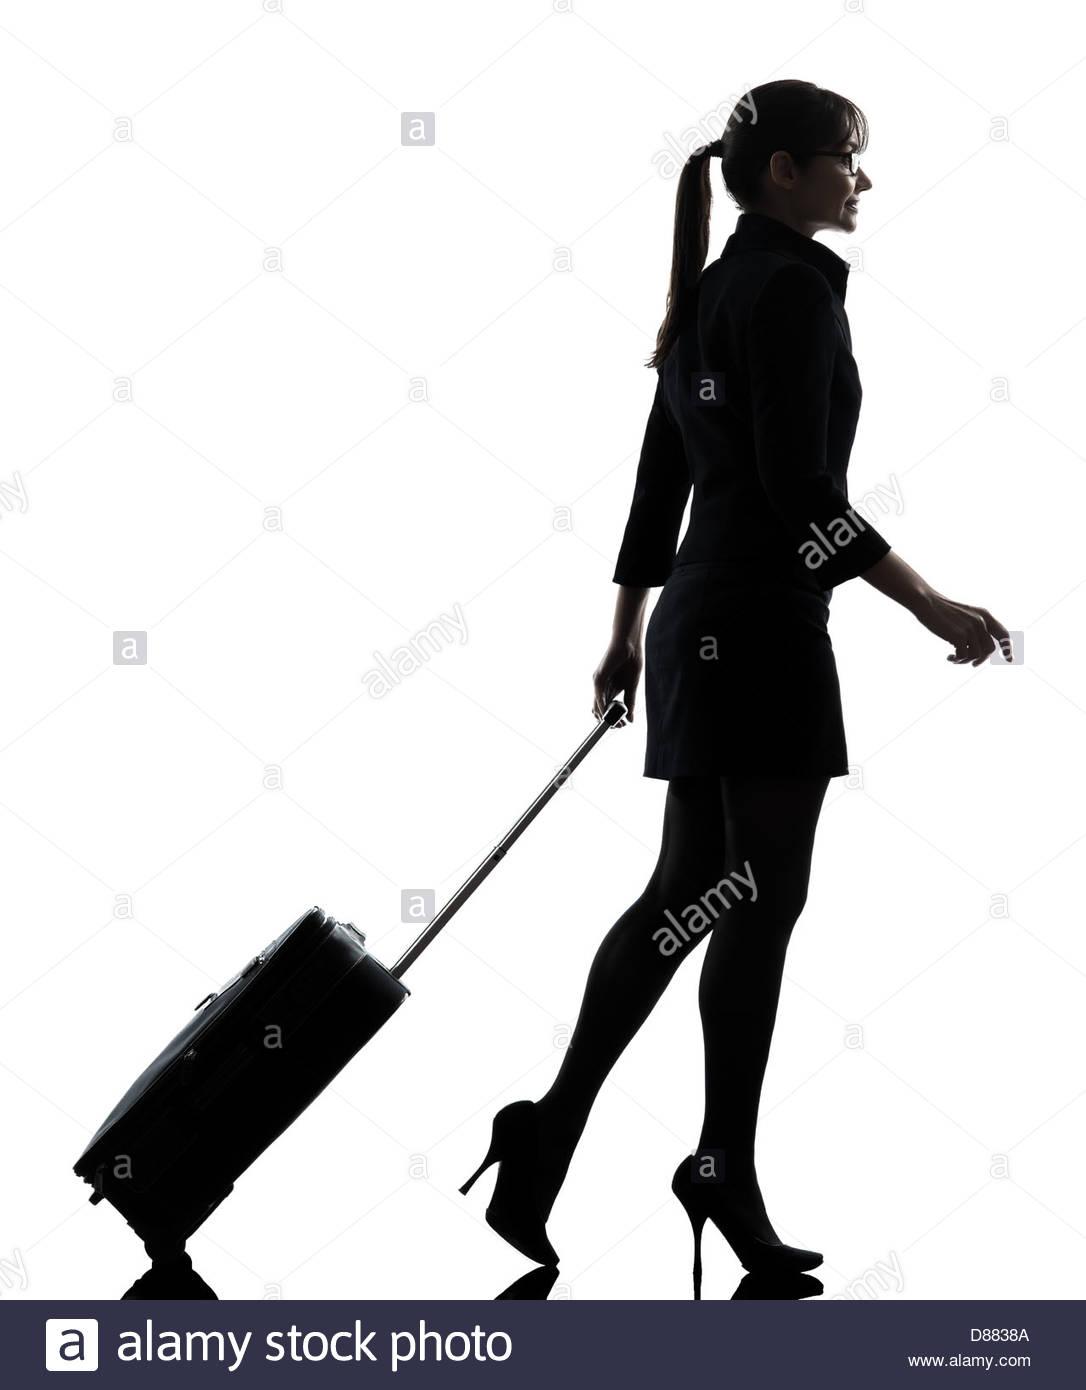 1086x1390 One Business Woman Traveler Walking Suitcase Silhouette Studio